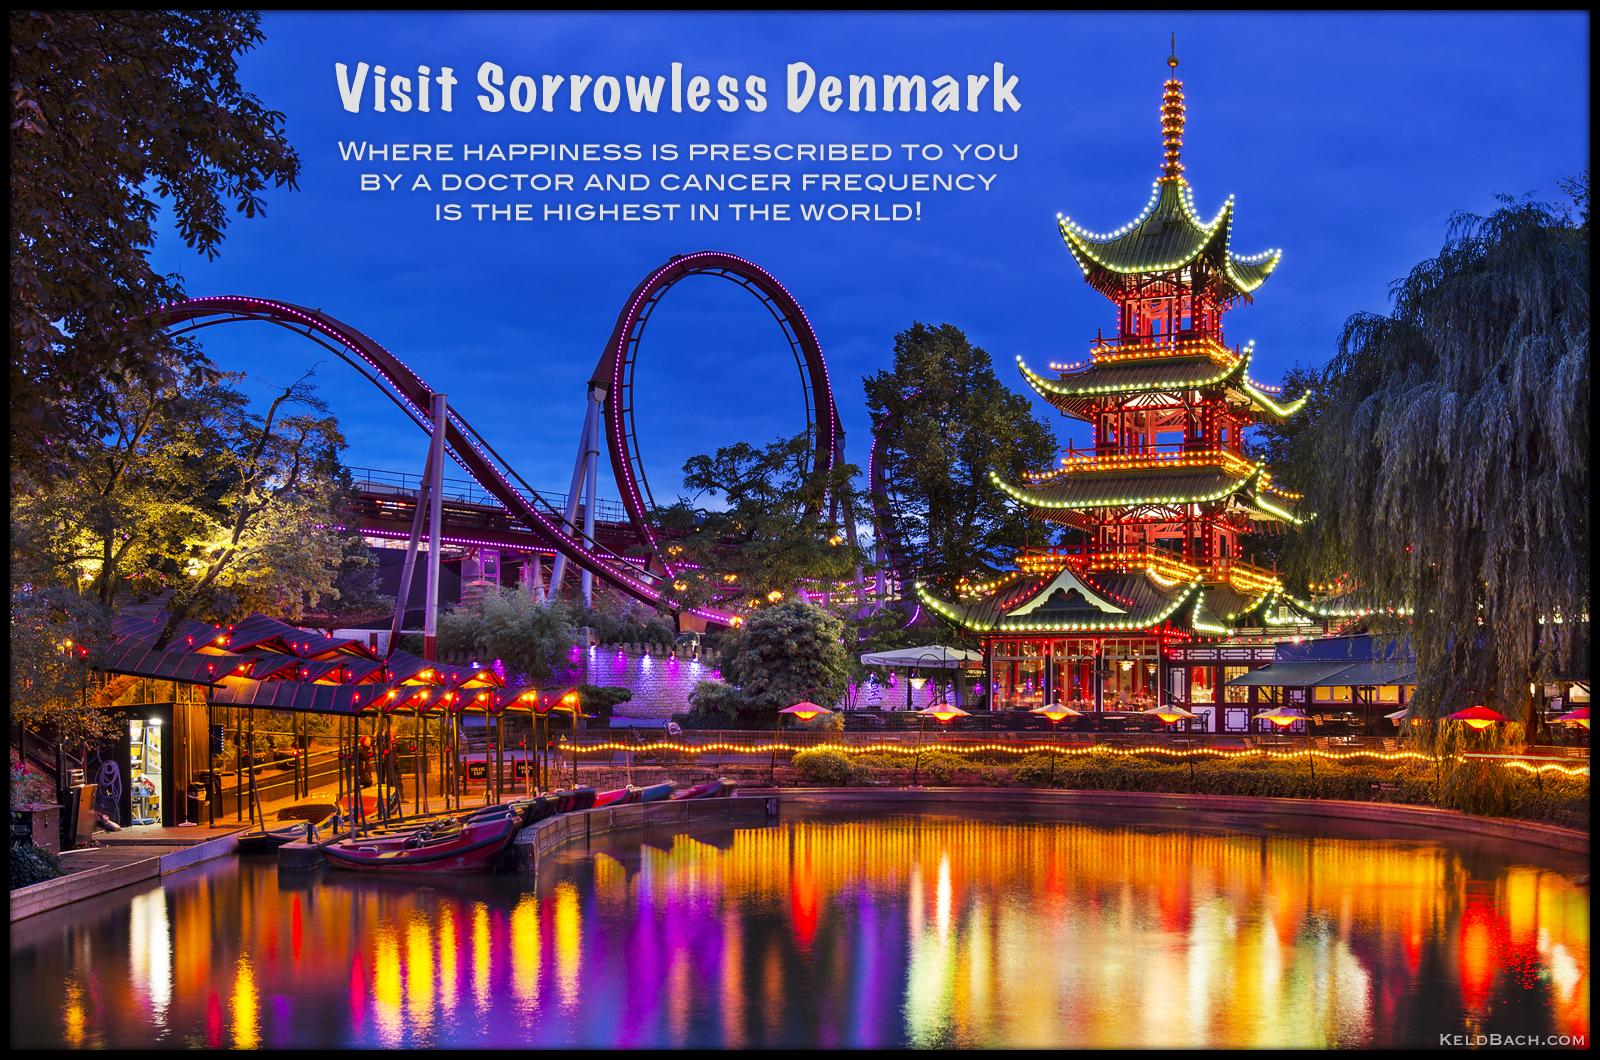 Visit 'Sorrowless' Denmark by KeldBach